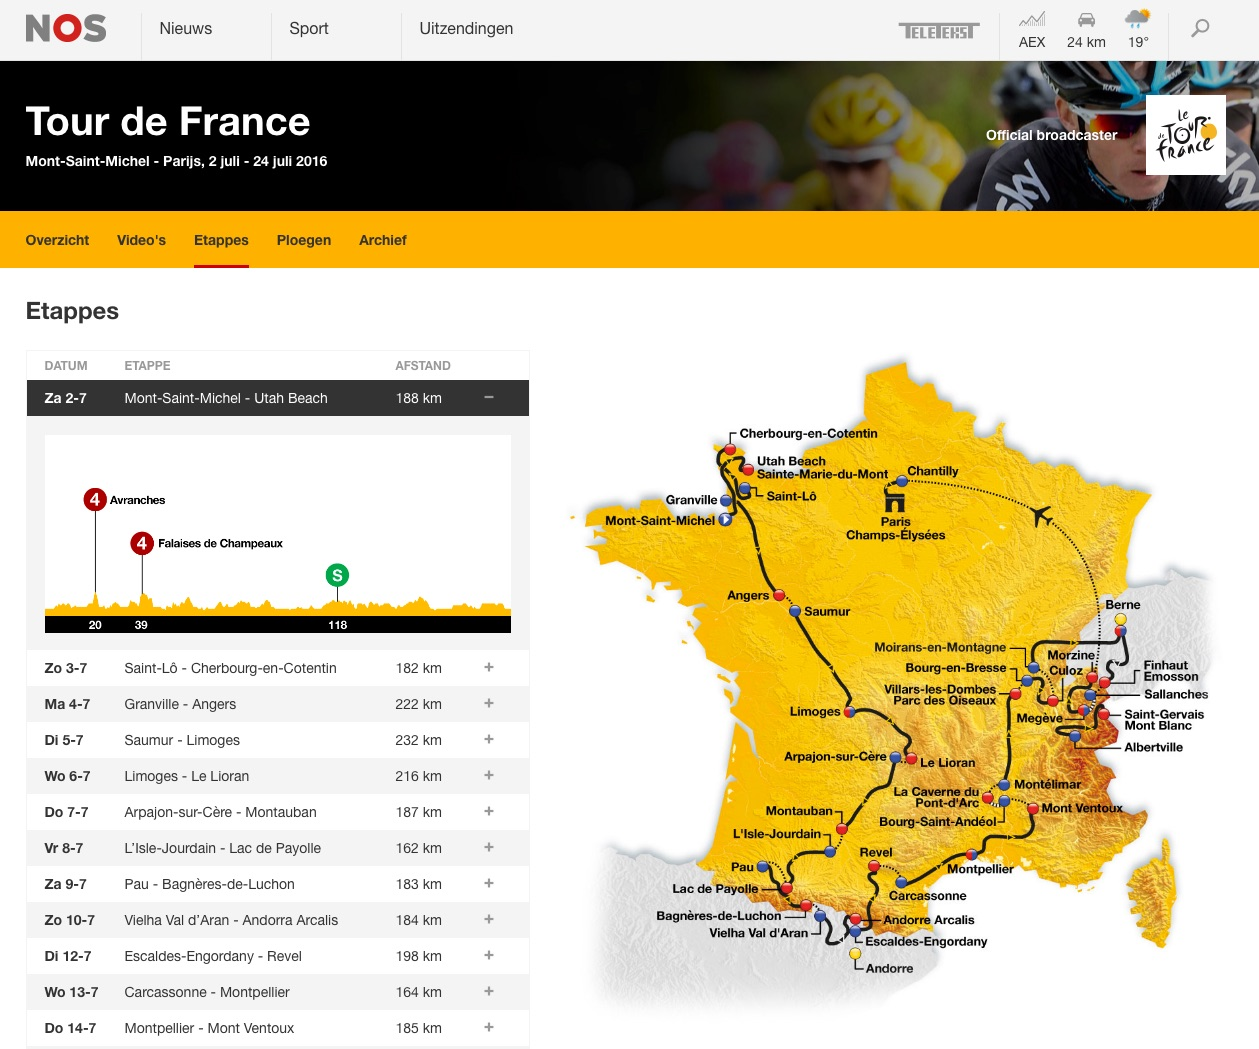 livestream Tour de France en etappeoverzicht bij de NOS